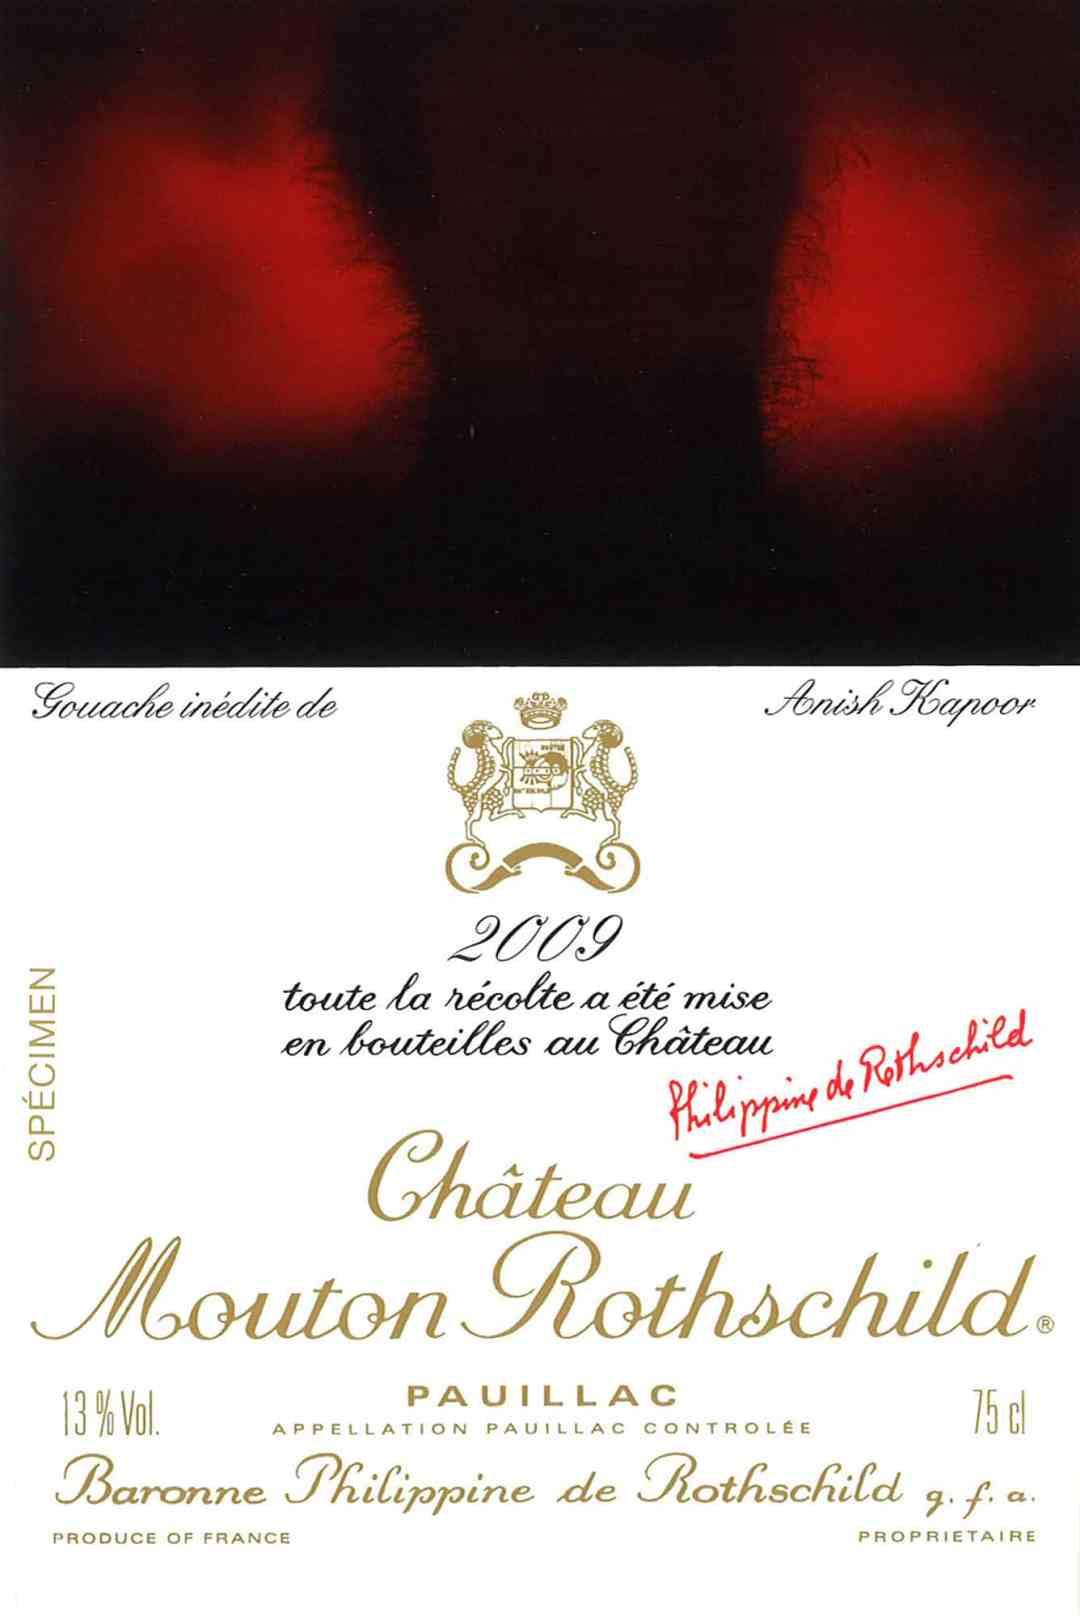 Etiquette designed by Anish Kapoor, Château Mouton Rothschild